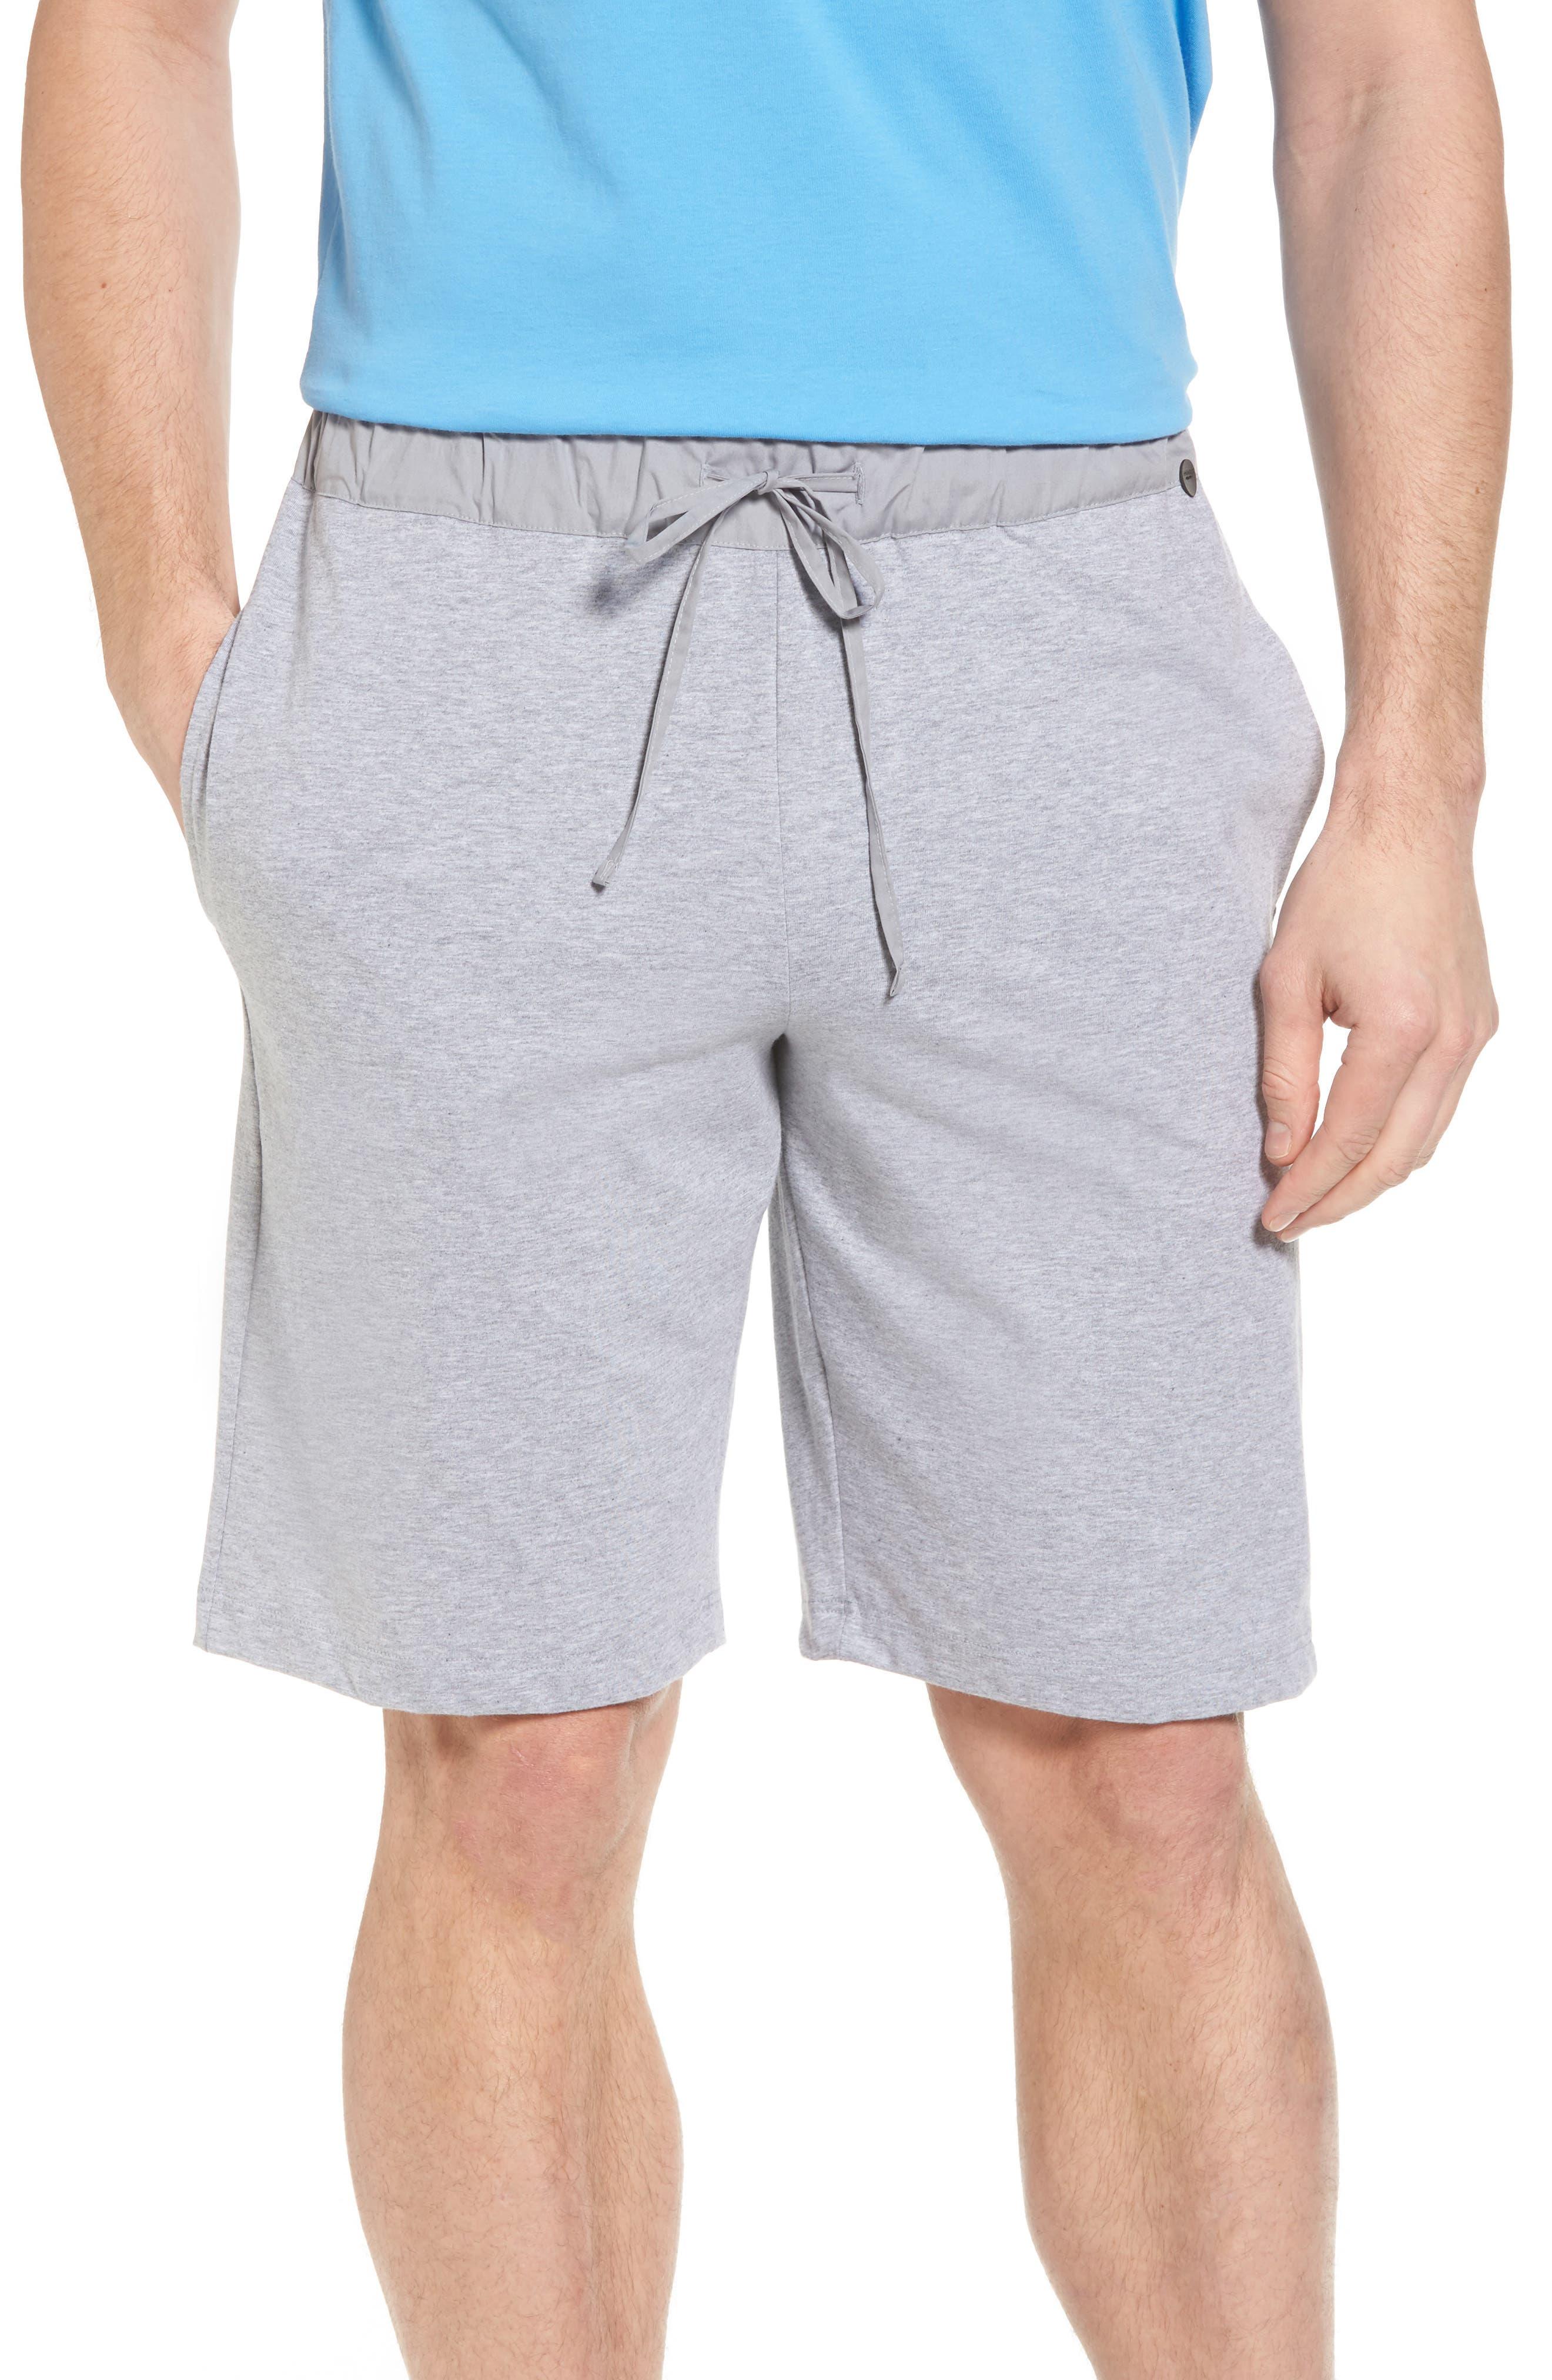 Night & Day Knit Shorts,                         Main,                         color, SILVER MELANGE